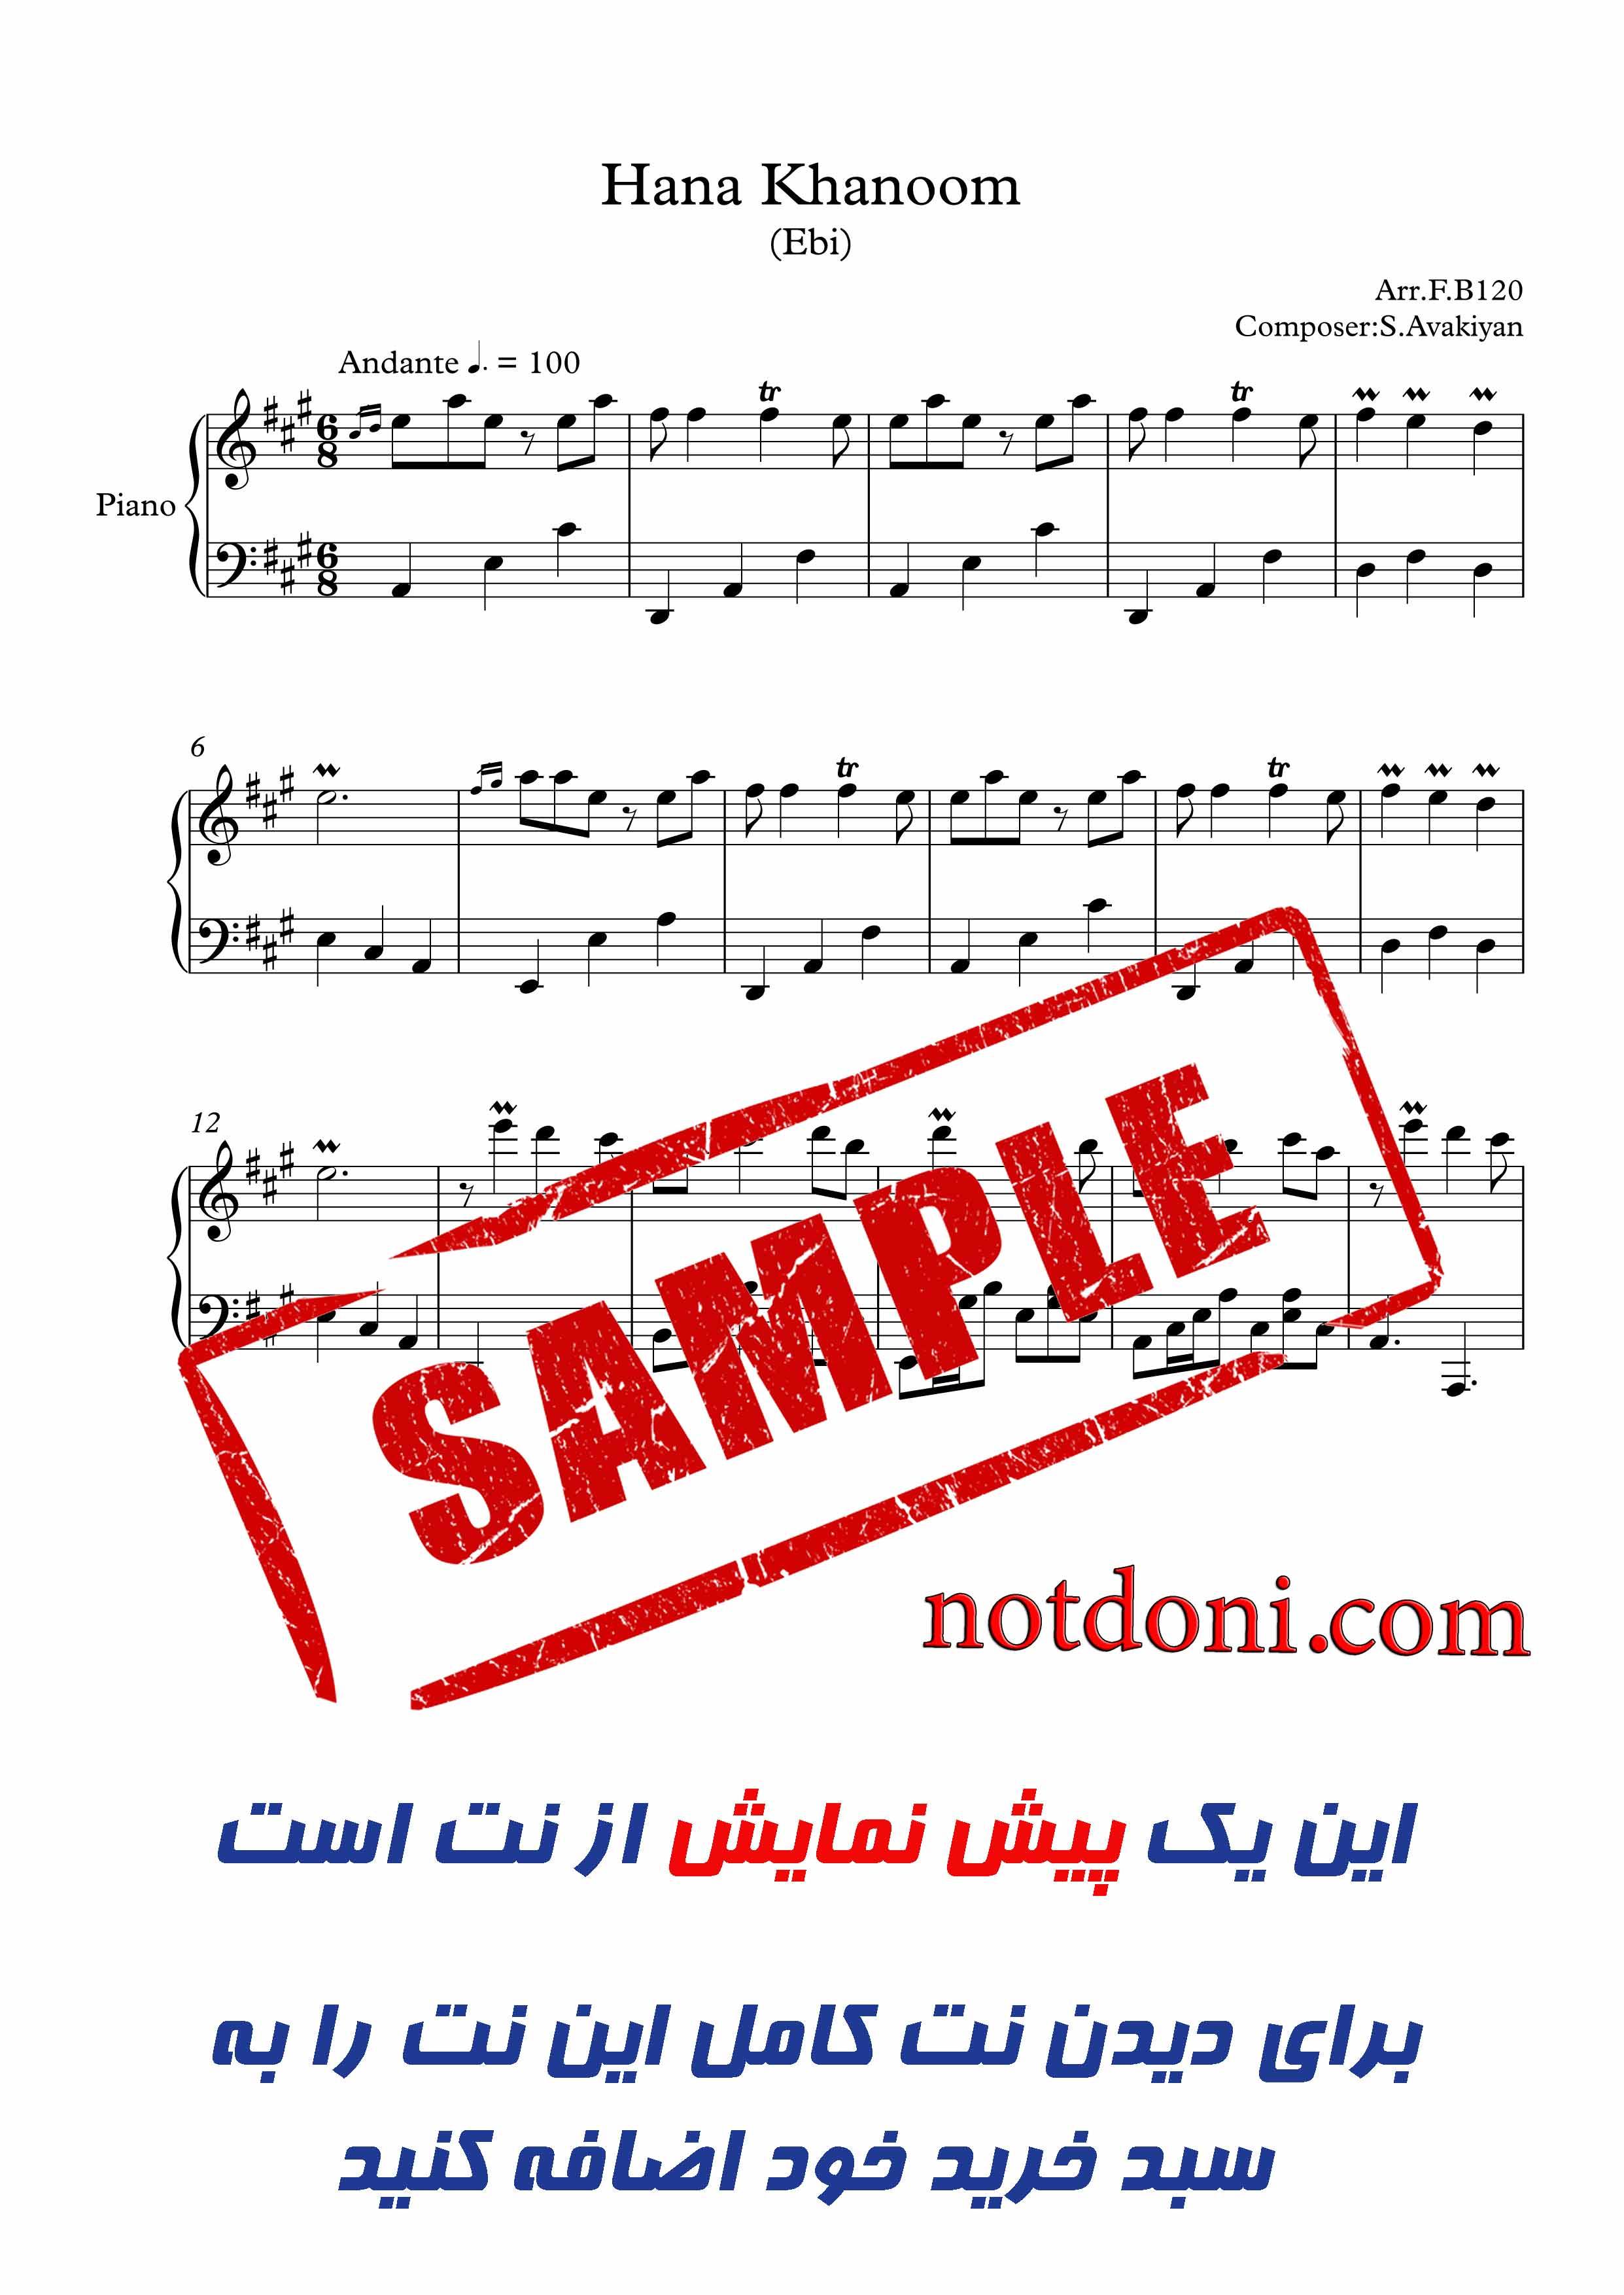 faee5273-27c5-4dc6-8211-be7d04f12449_نت-آهنگ.jpg